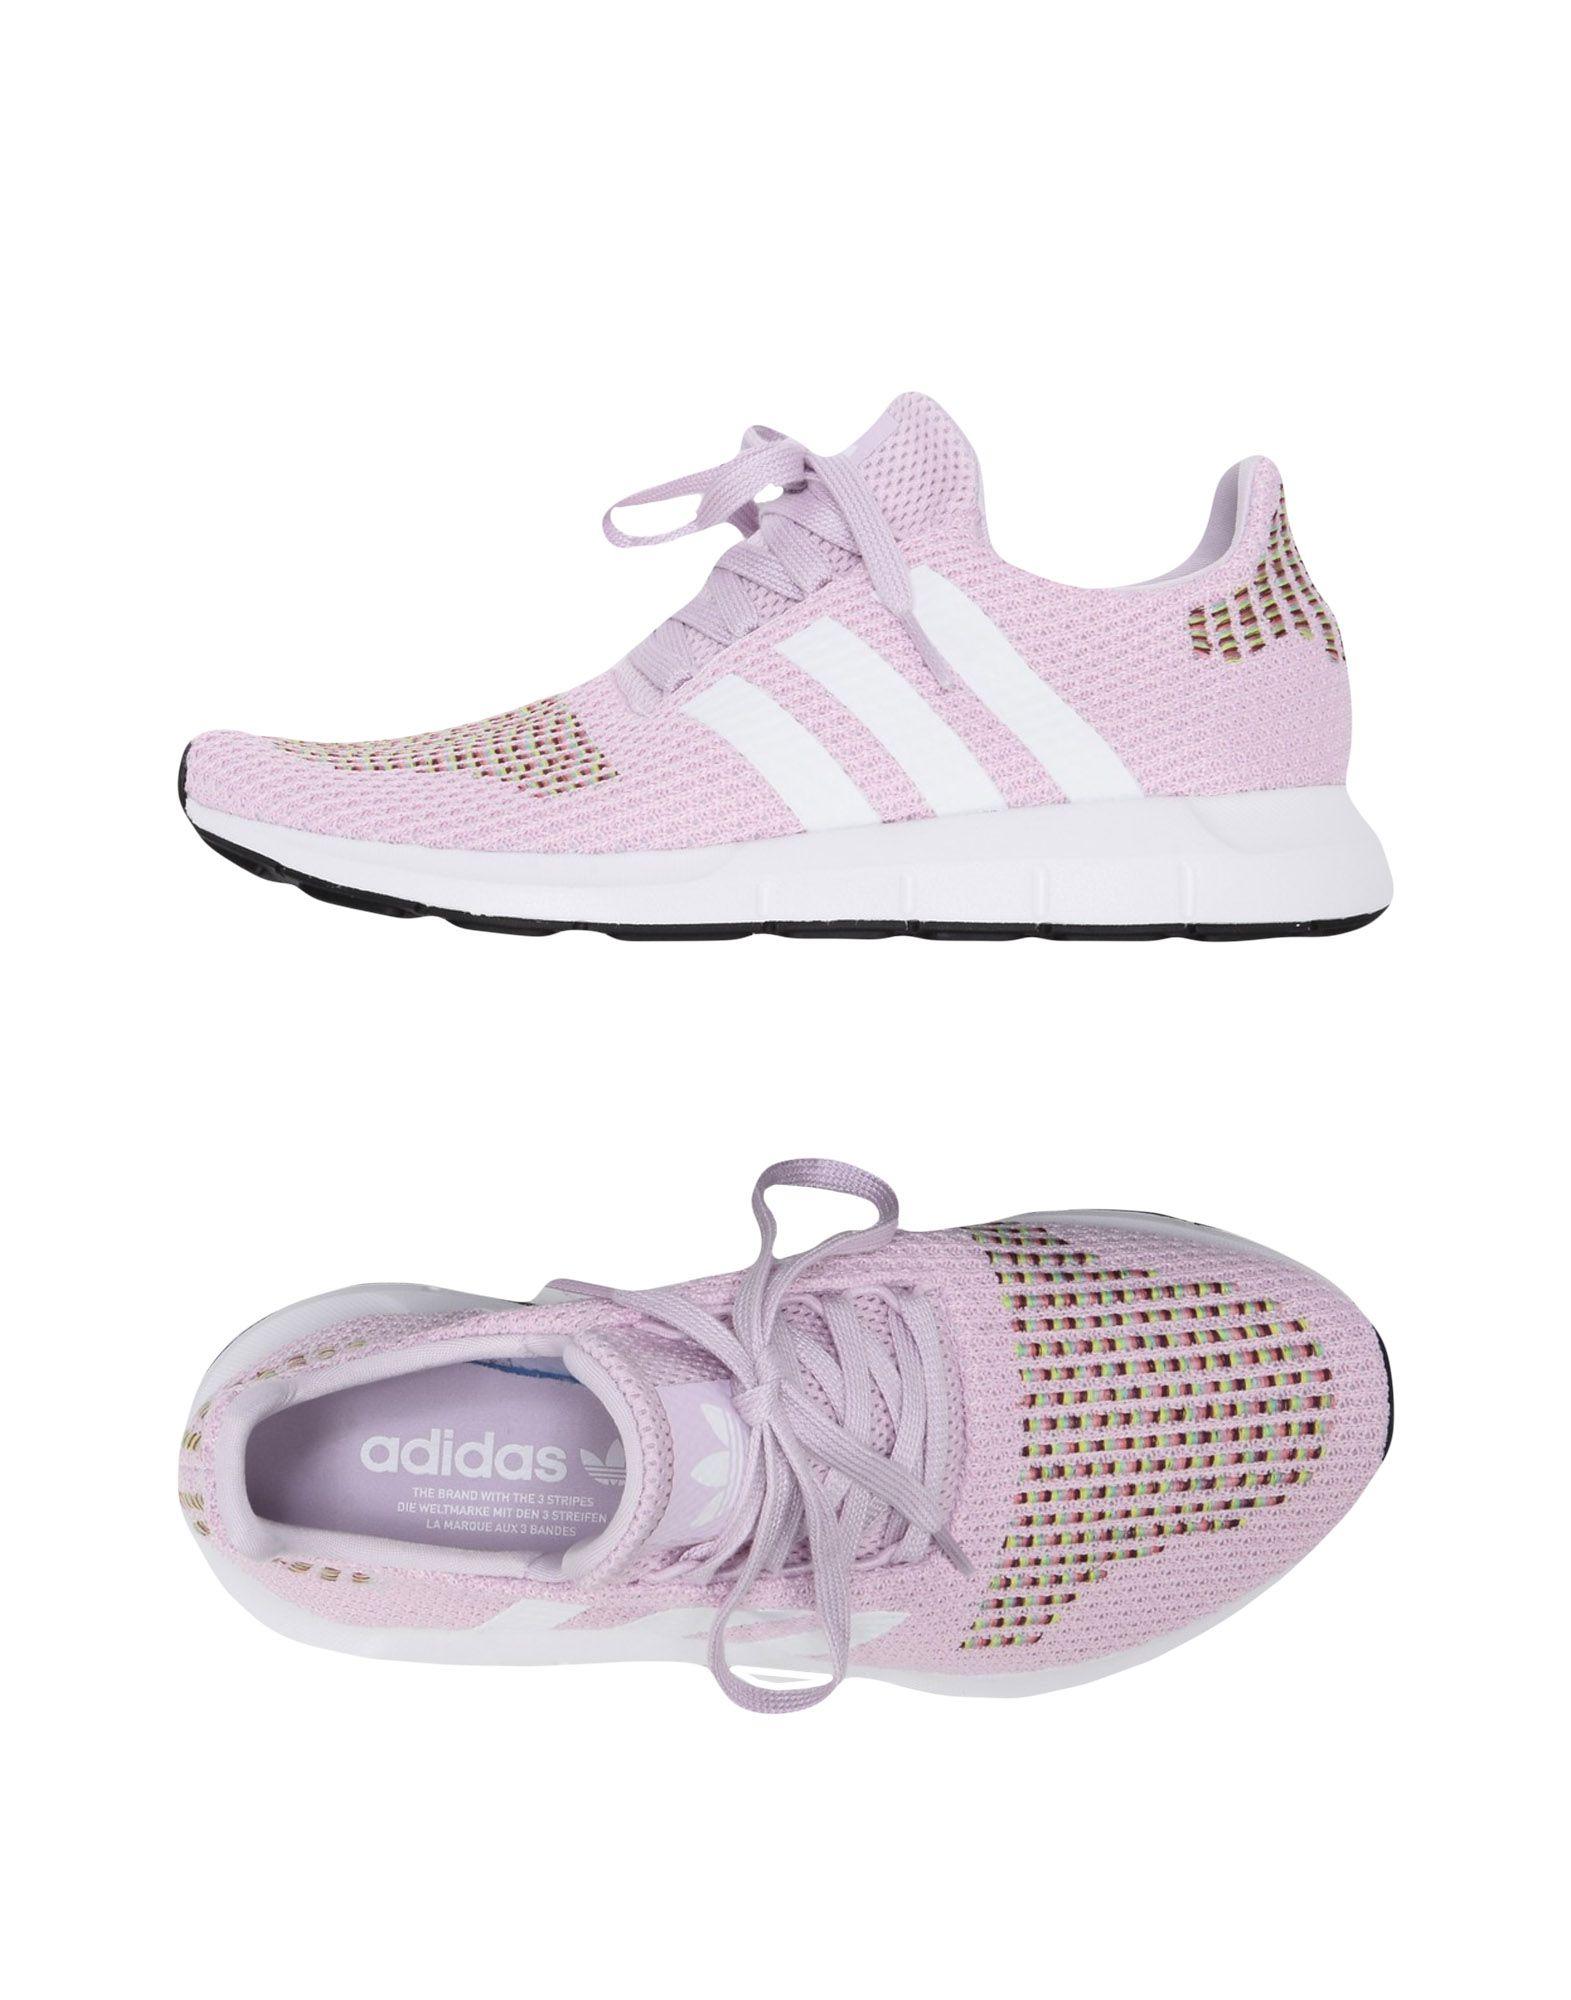 Adidas Originals Swift Run W  11459420QM Gute Qualität beliebte Schuhe